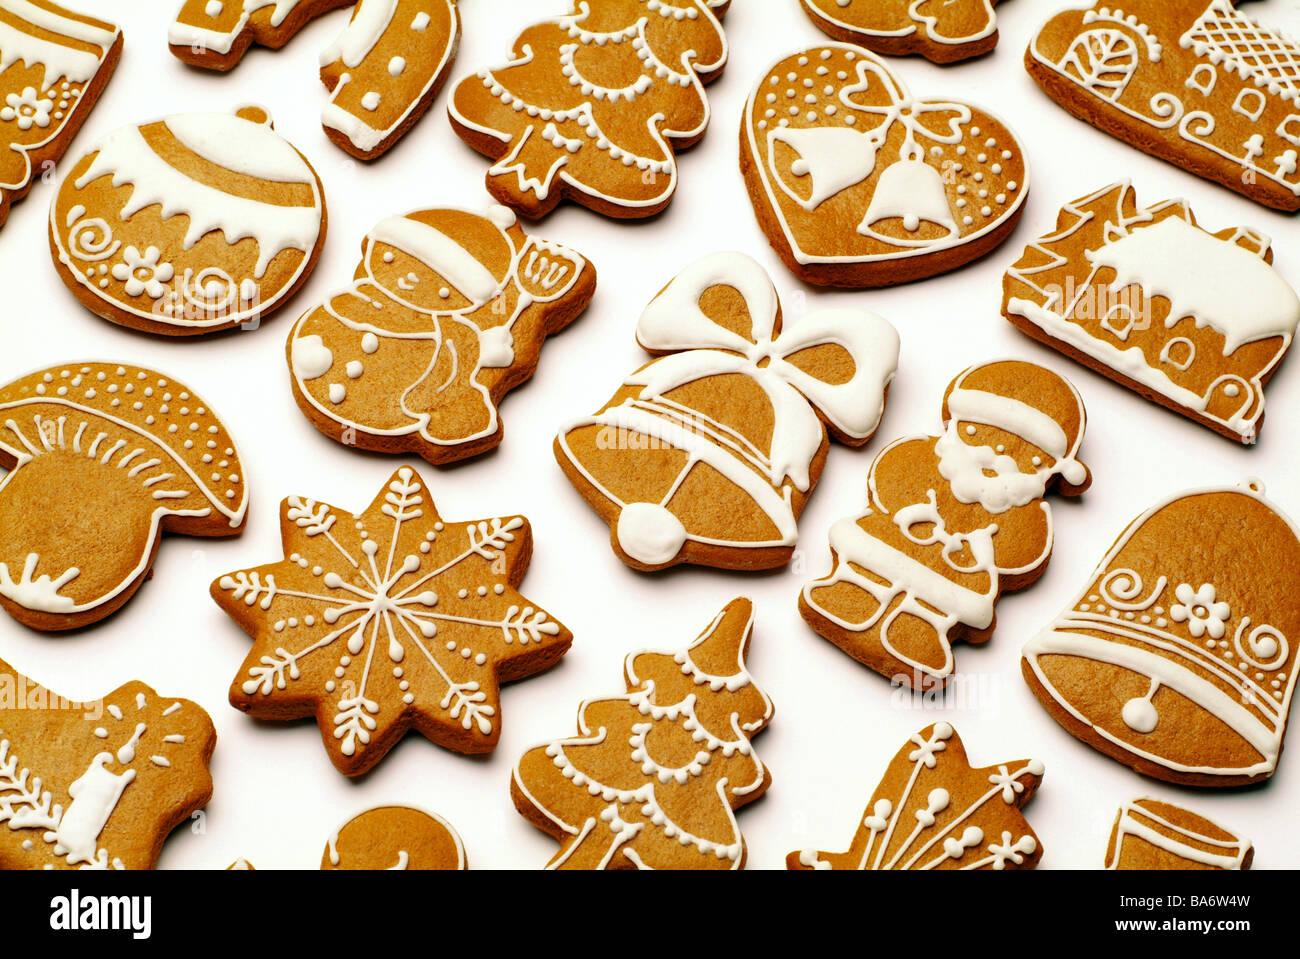 Christmas Tree Decoration Packs